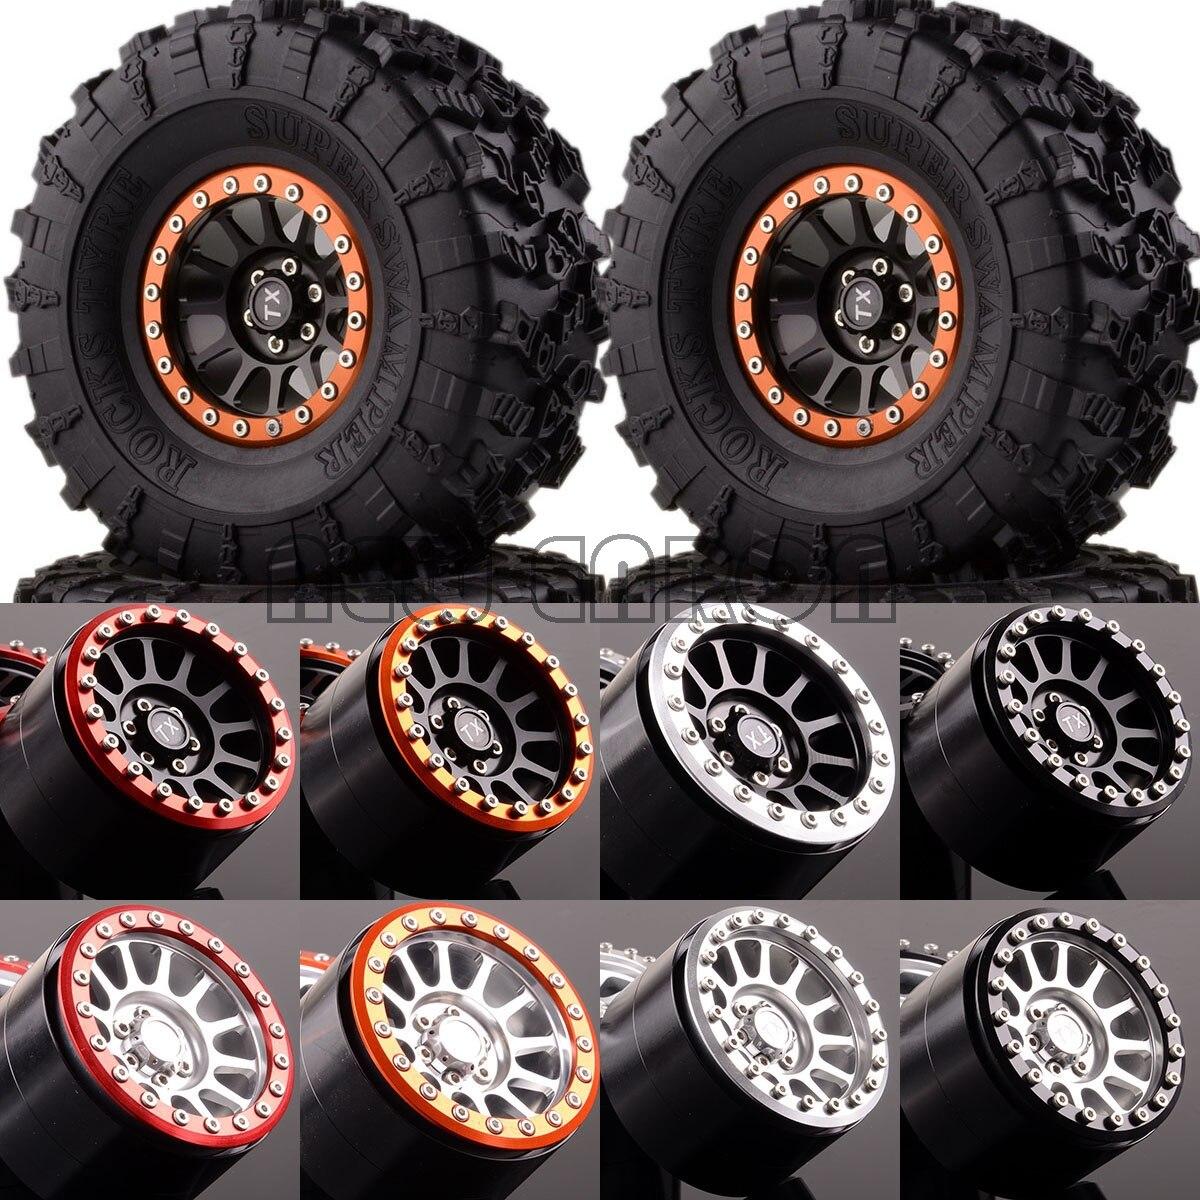 NEW ENRON 4P Aluminum 2.2 Beadlock Wheels & Tires 2022-3022 FOR Crawler Axial Traxxas HPI new enron 1 10 set aluminum 2 2 beadlock wheels